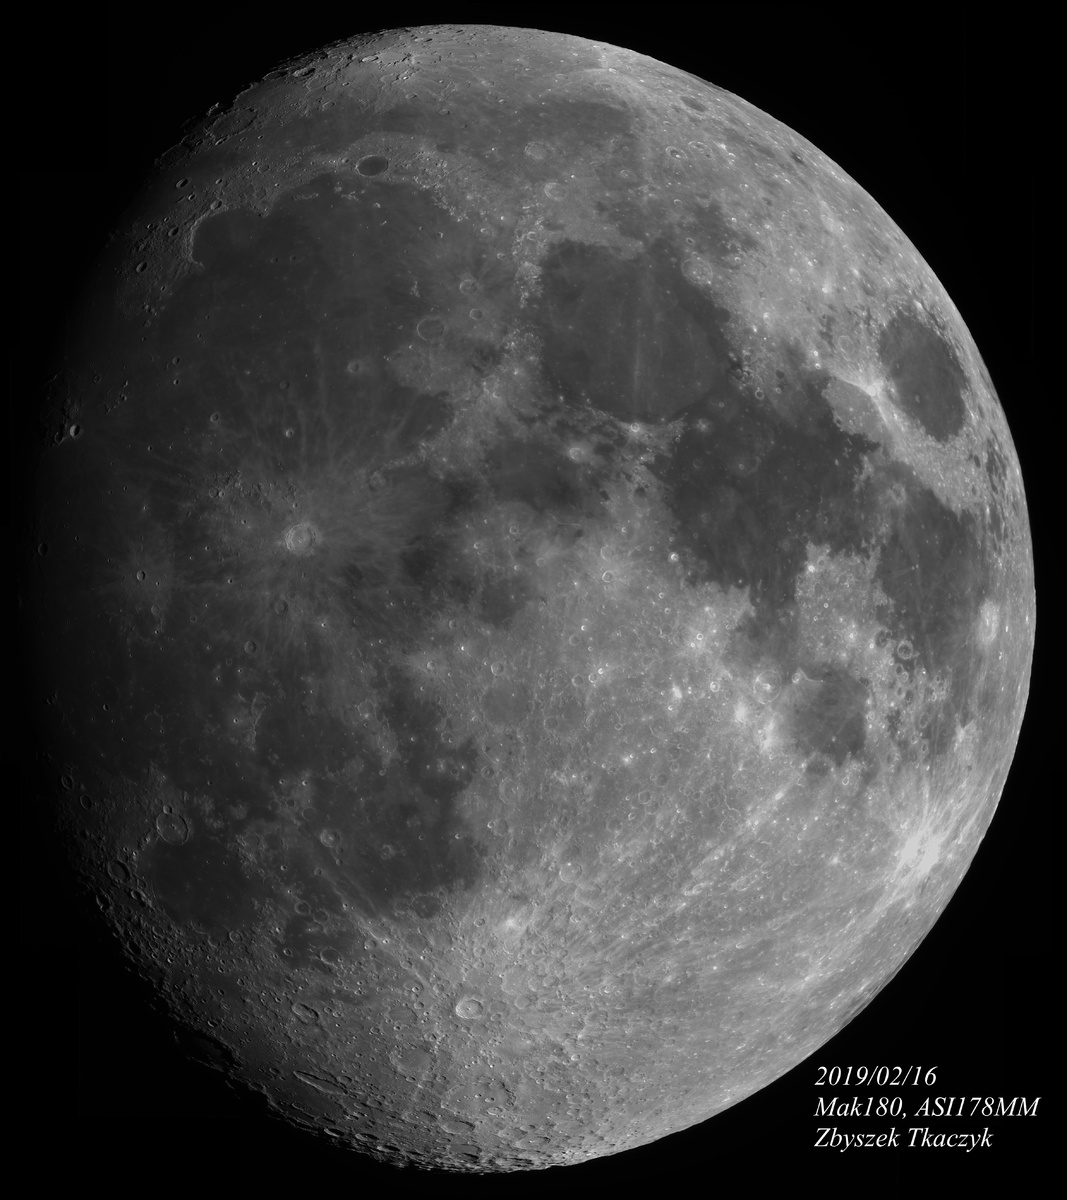 Moon_2019_02_16_stitch4_7_res_50_proc.thumb.jpg.8e503b3fe2fe2bd81fa7b9a117b012a1.jpg